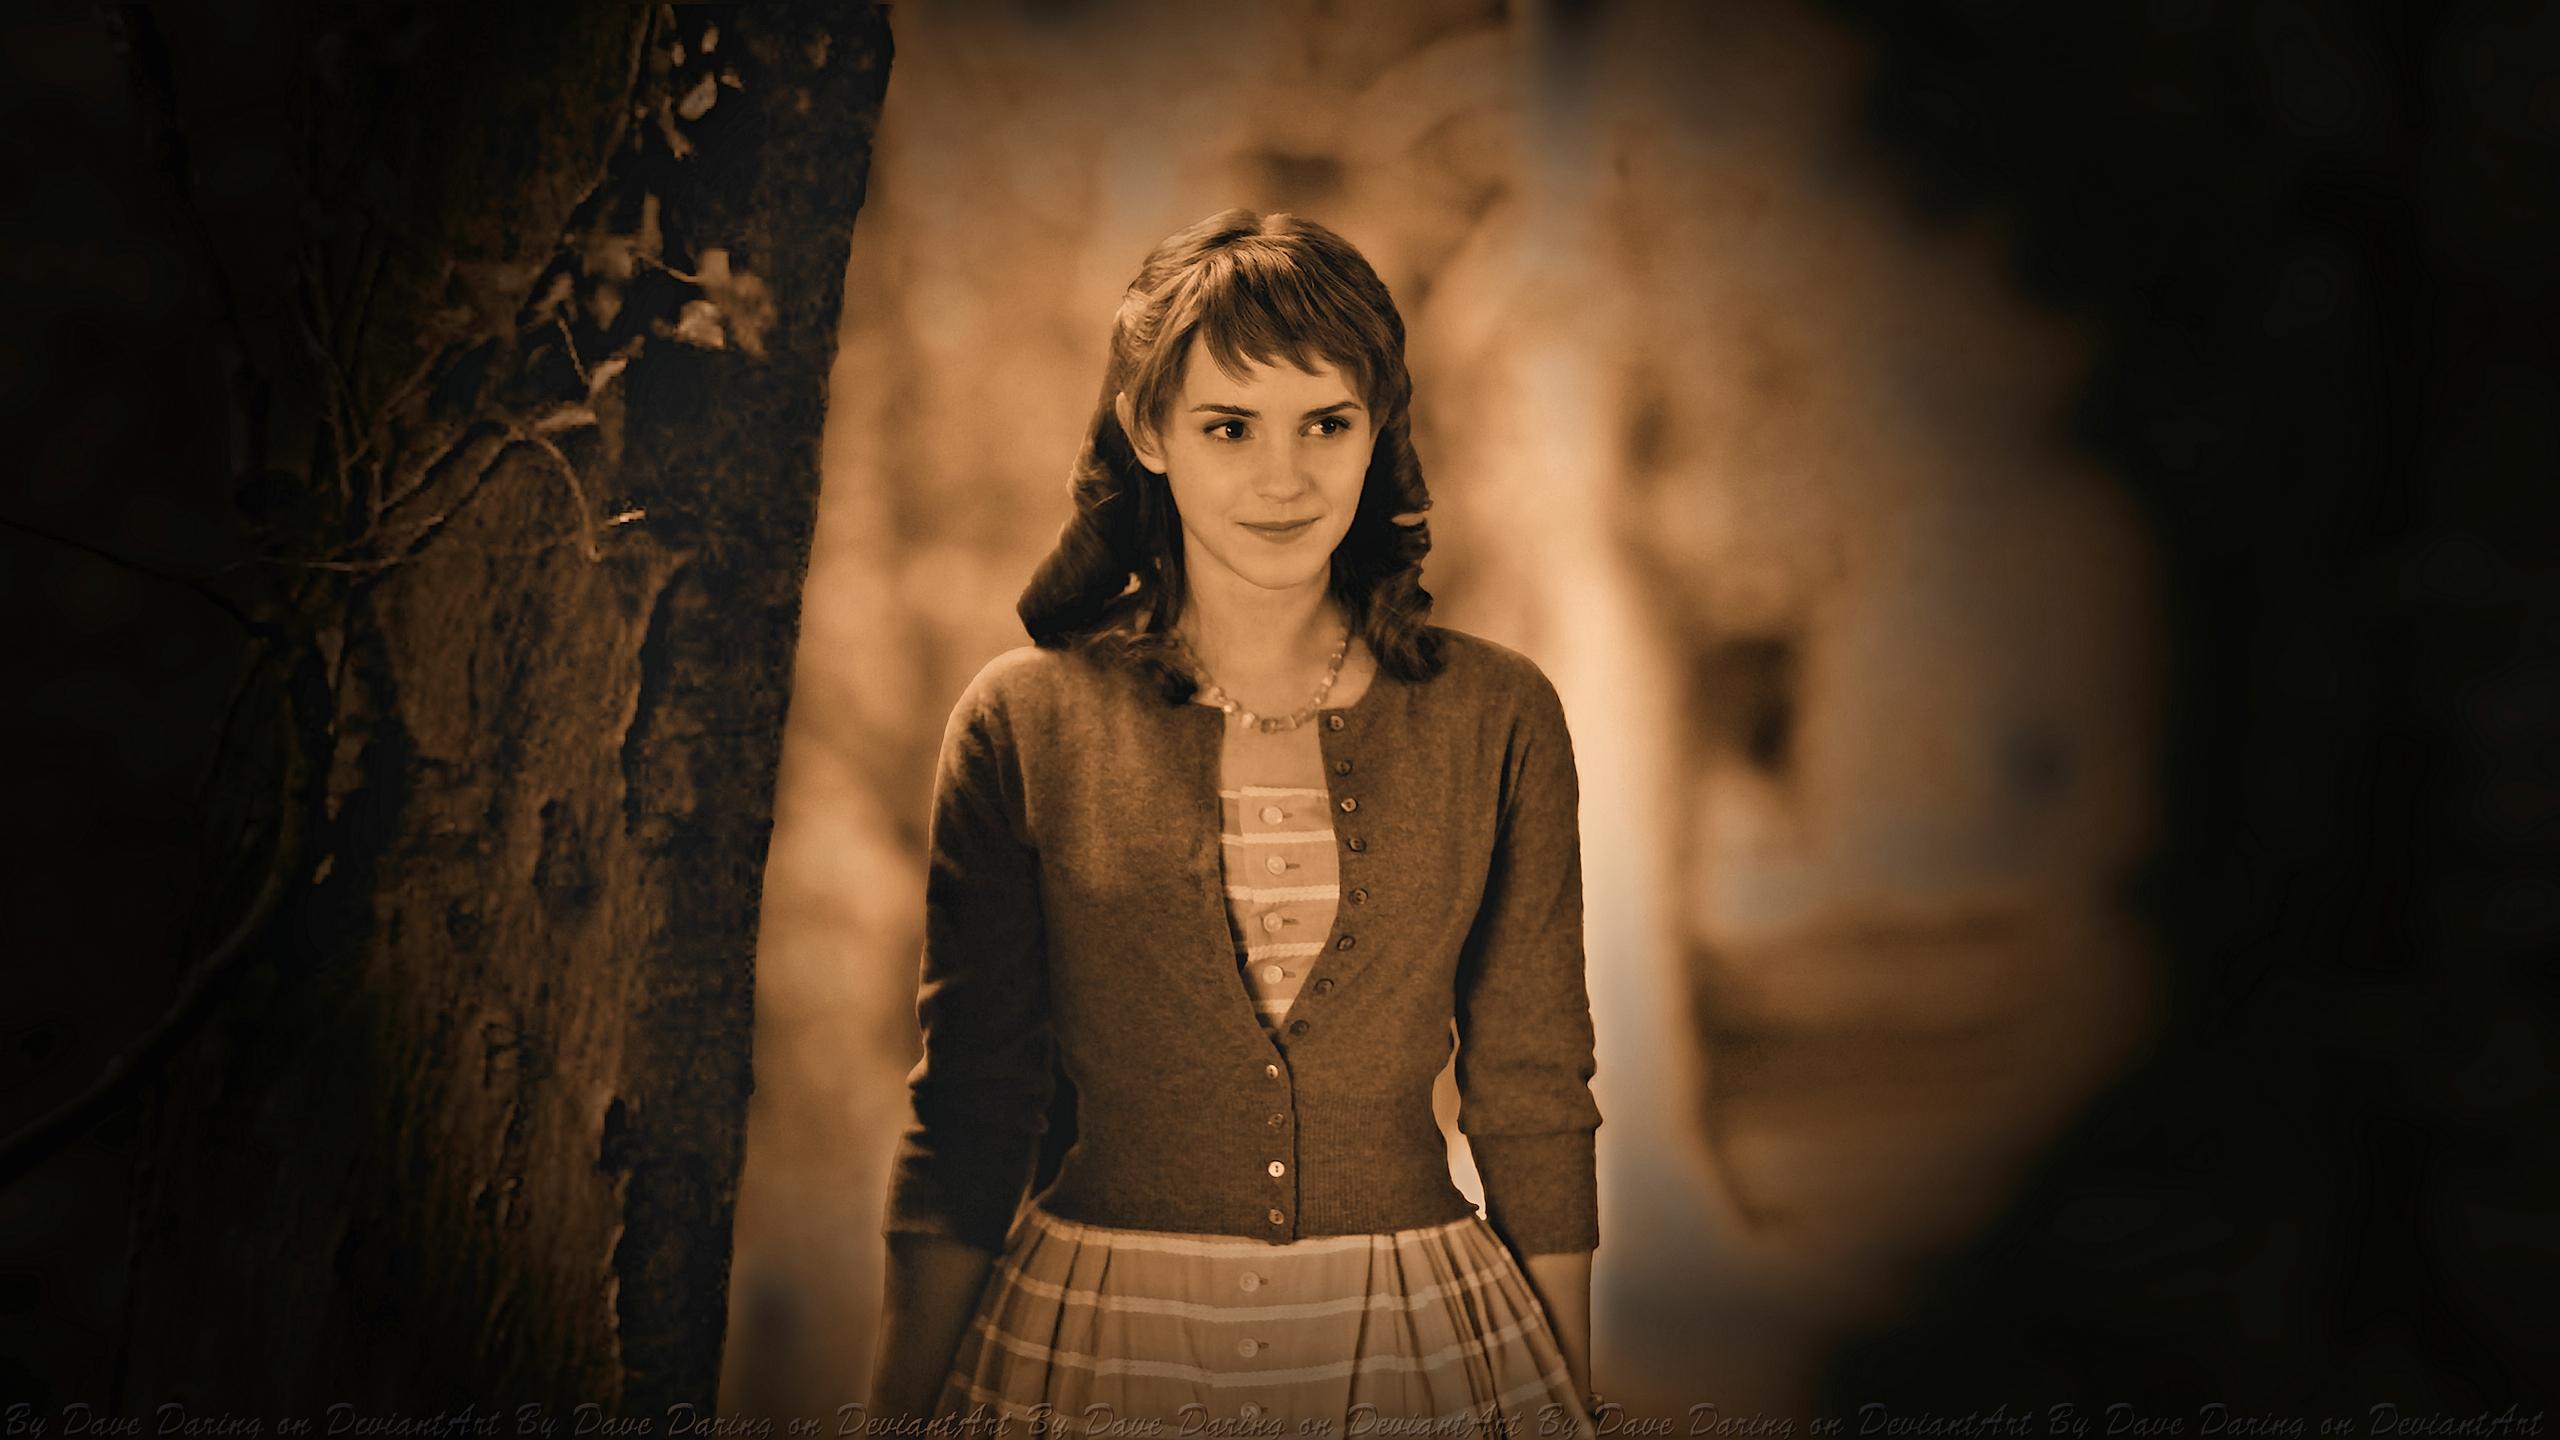 Emma Watson Silent Era by Dave-Daring